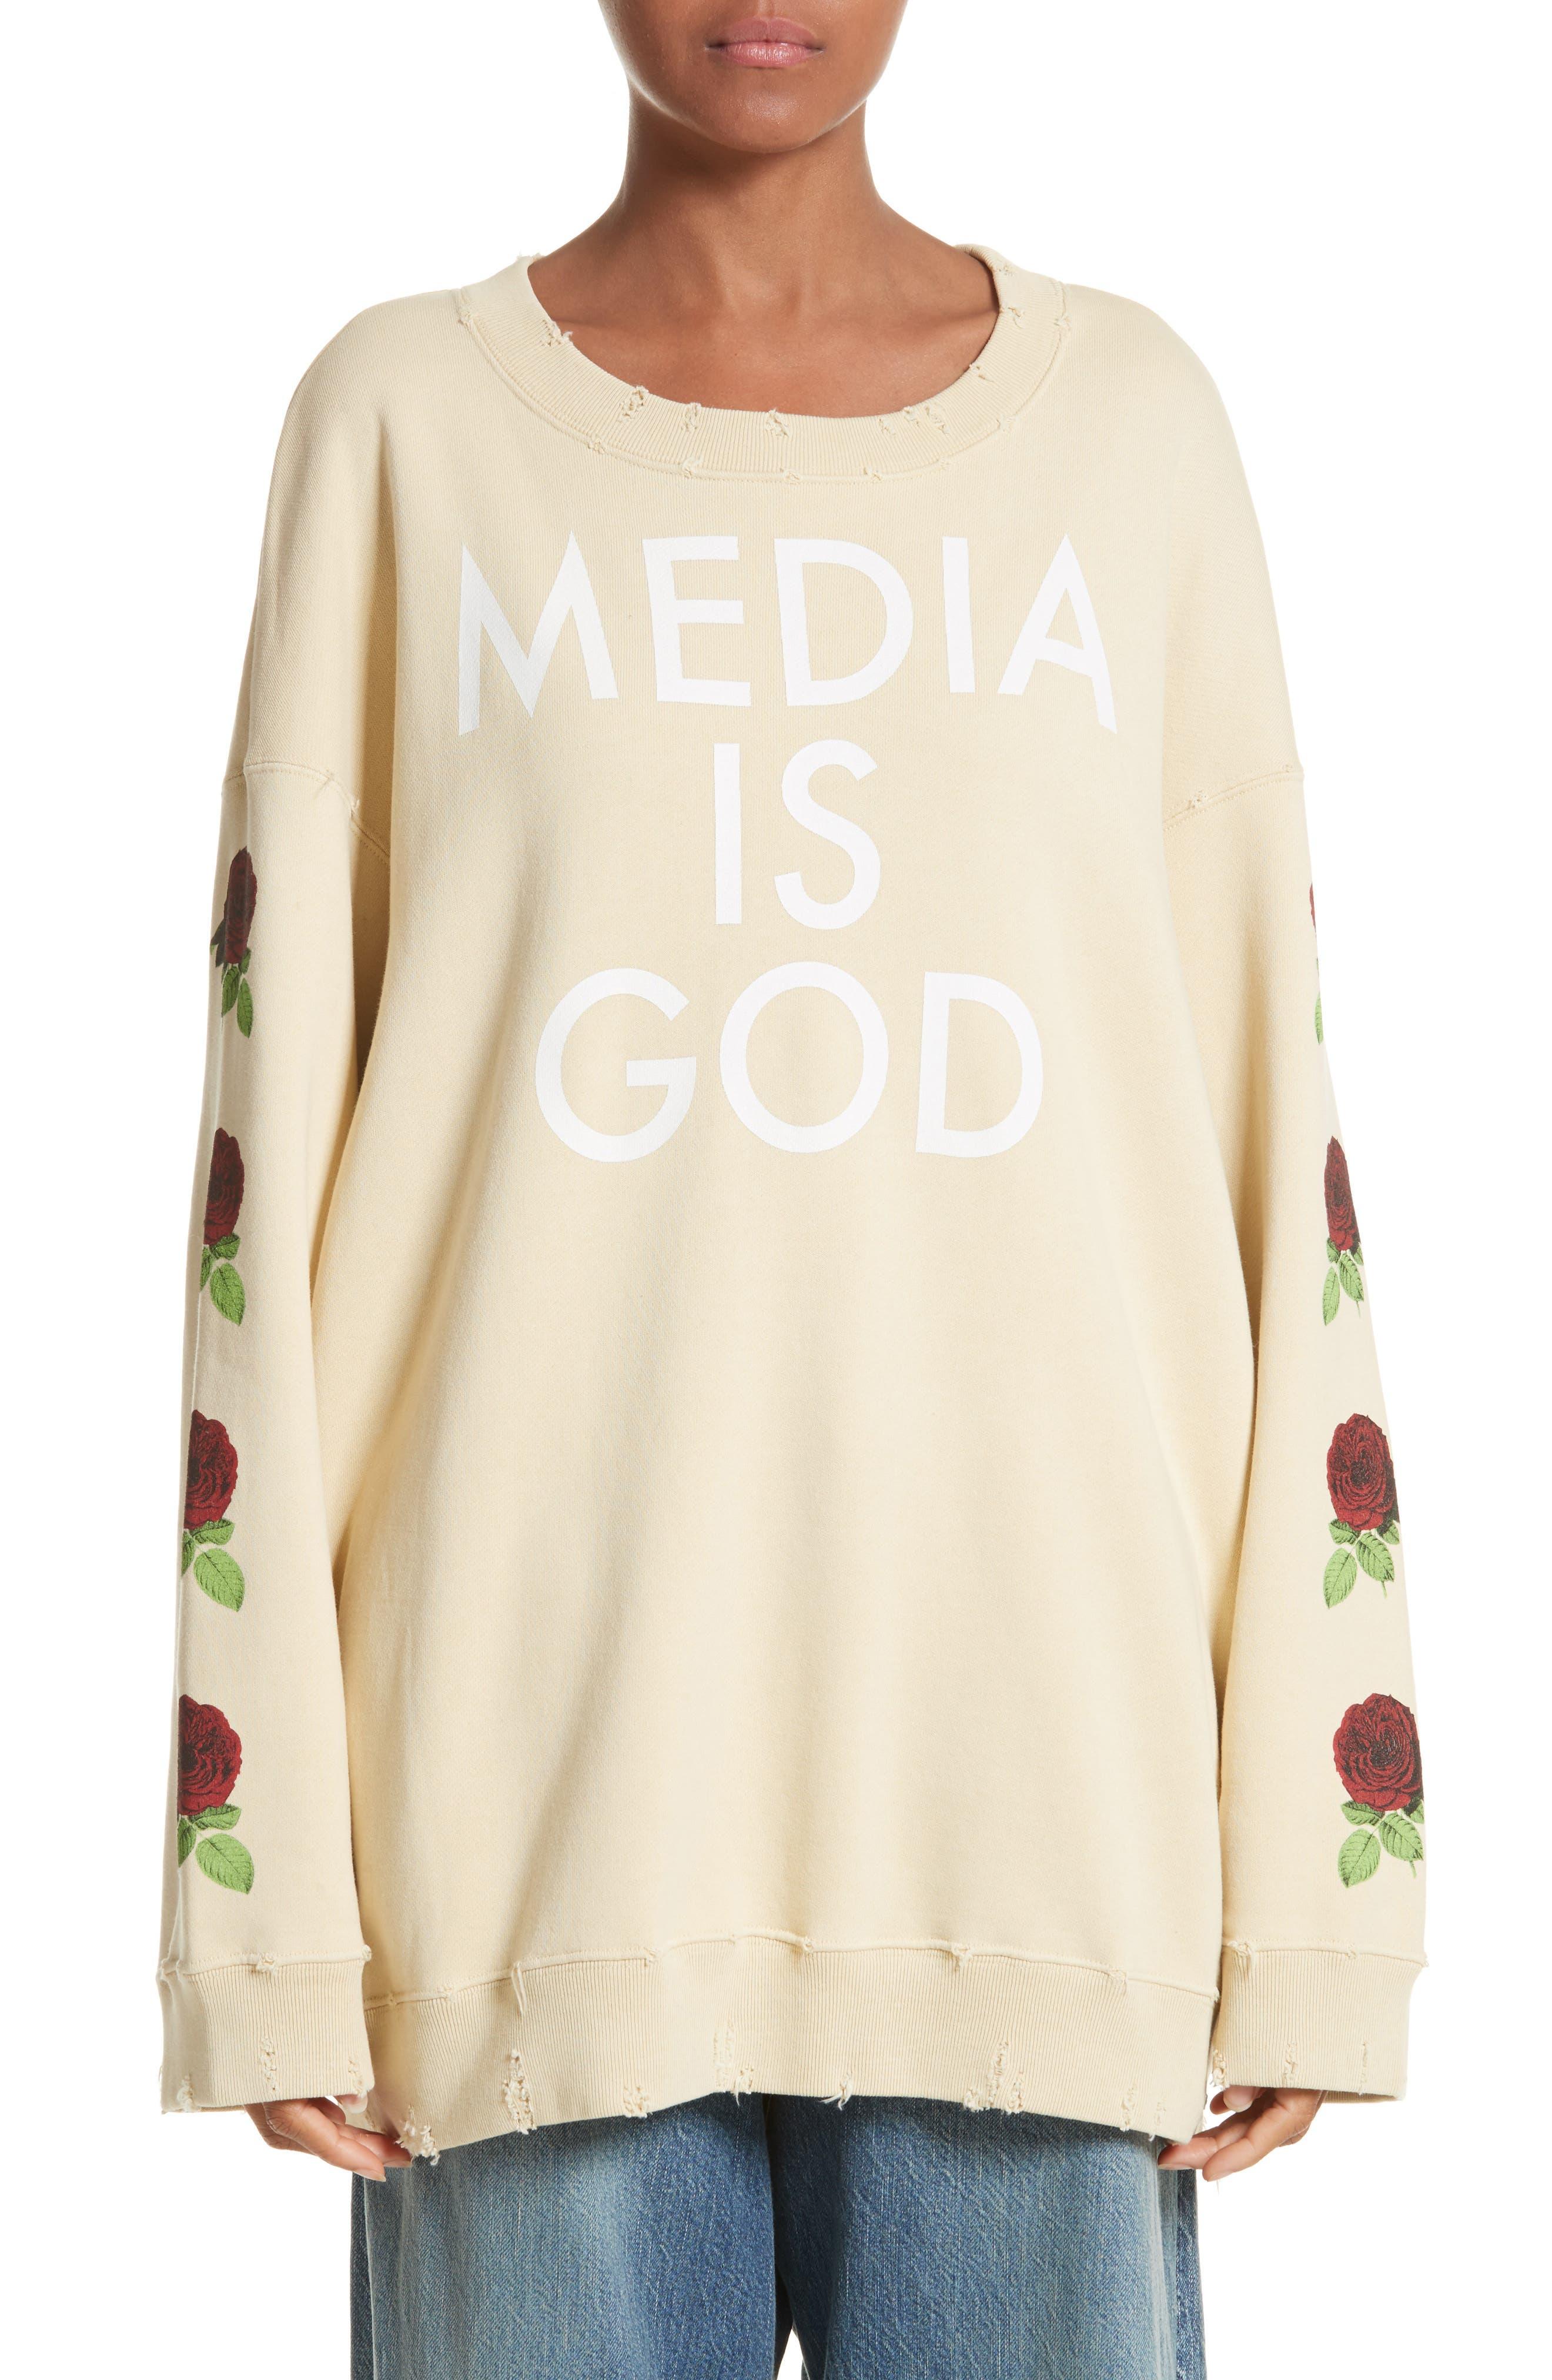 Media Is God Sweatshirt,                             Main thumbnail 1, color,                             650